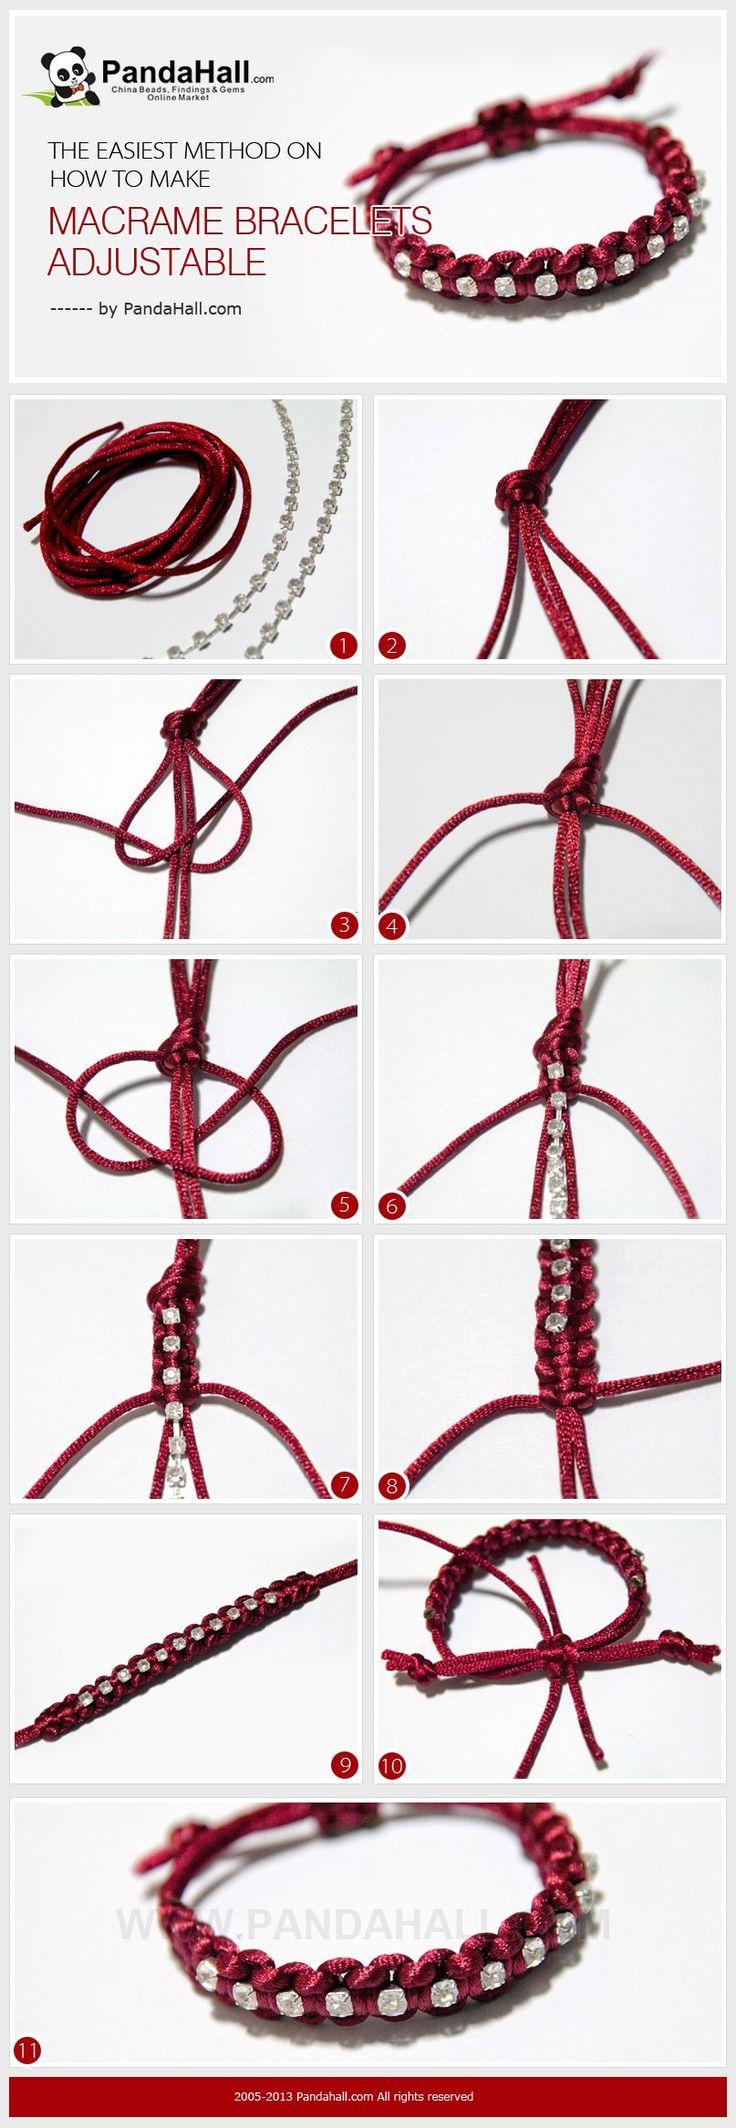 *adjustable macrame bracelet (use the chart)